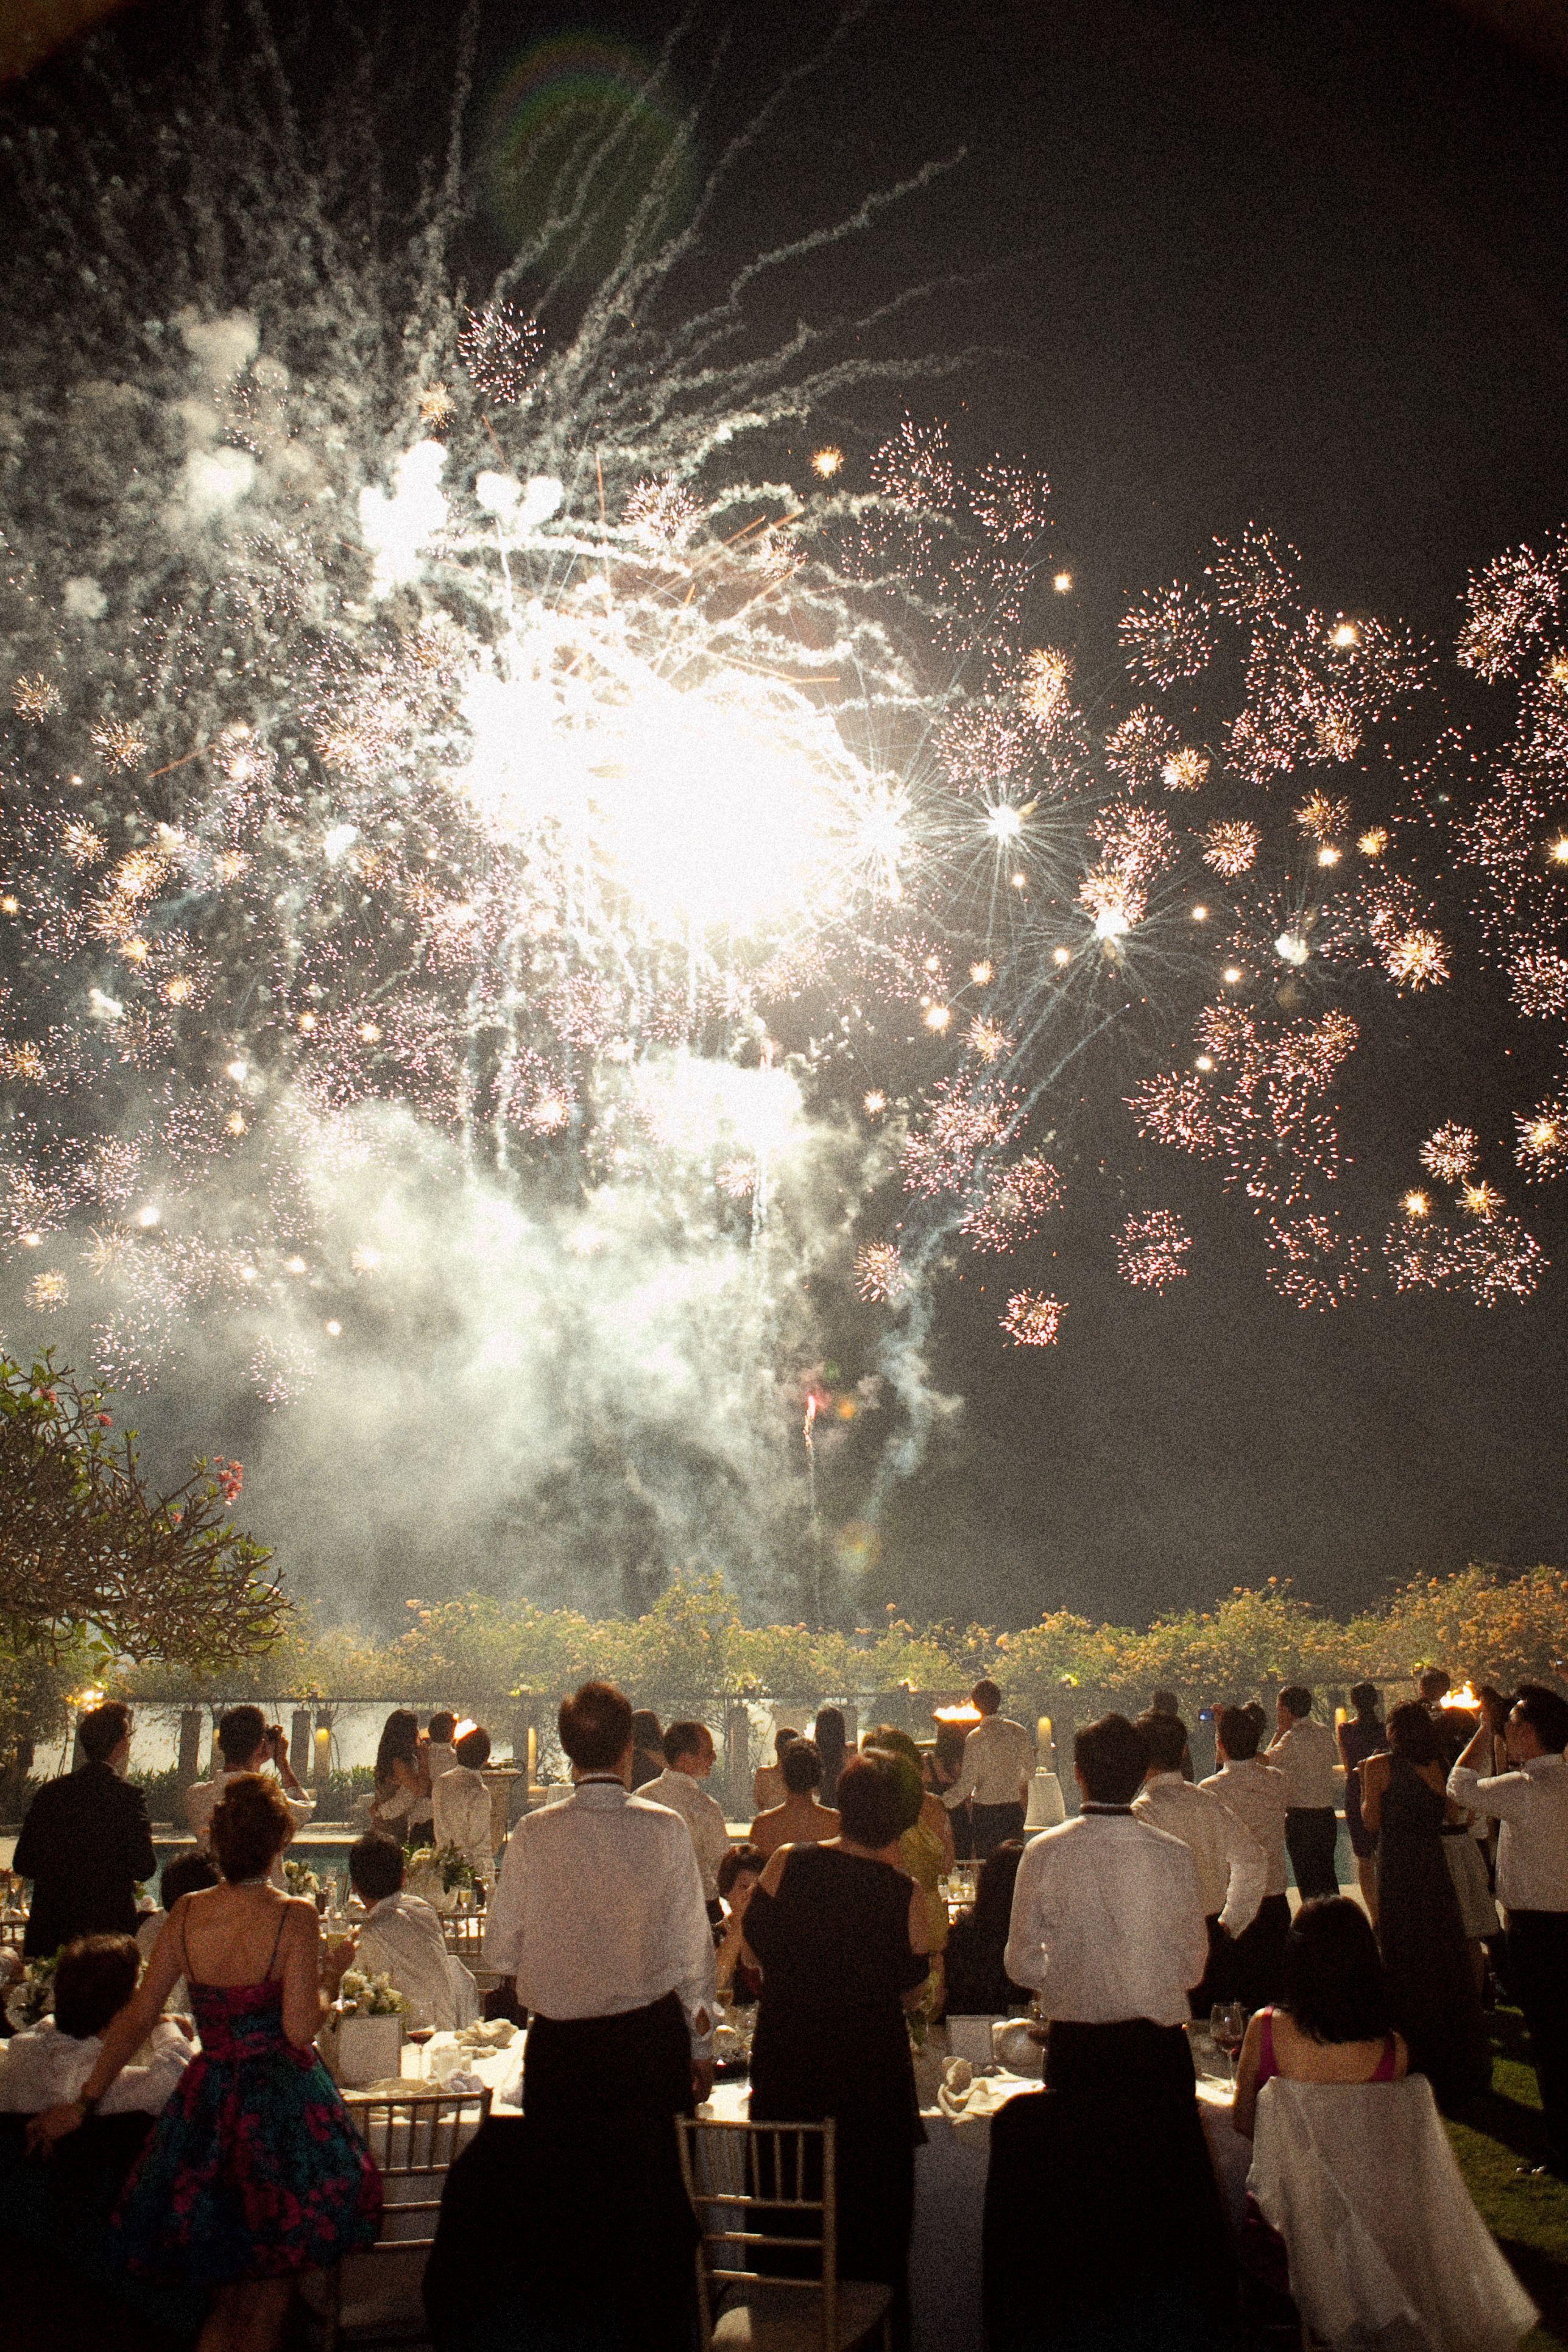 Fireworks in Bali.